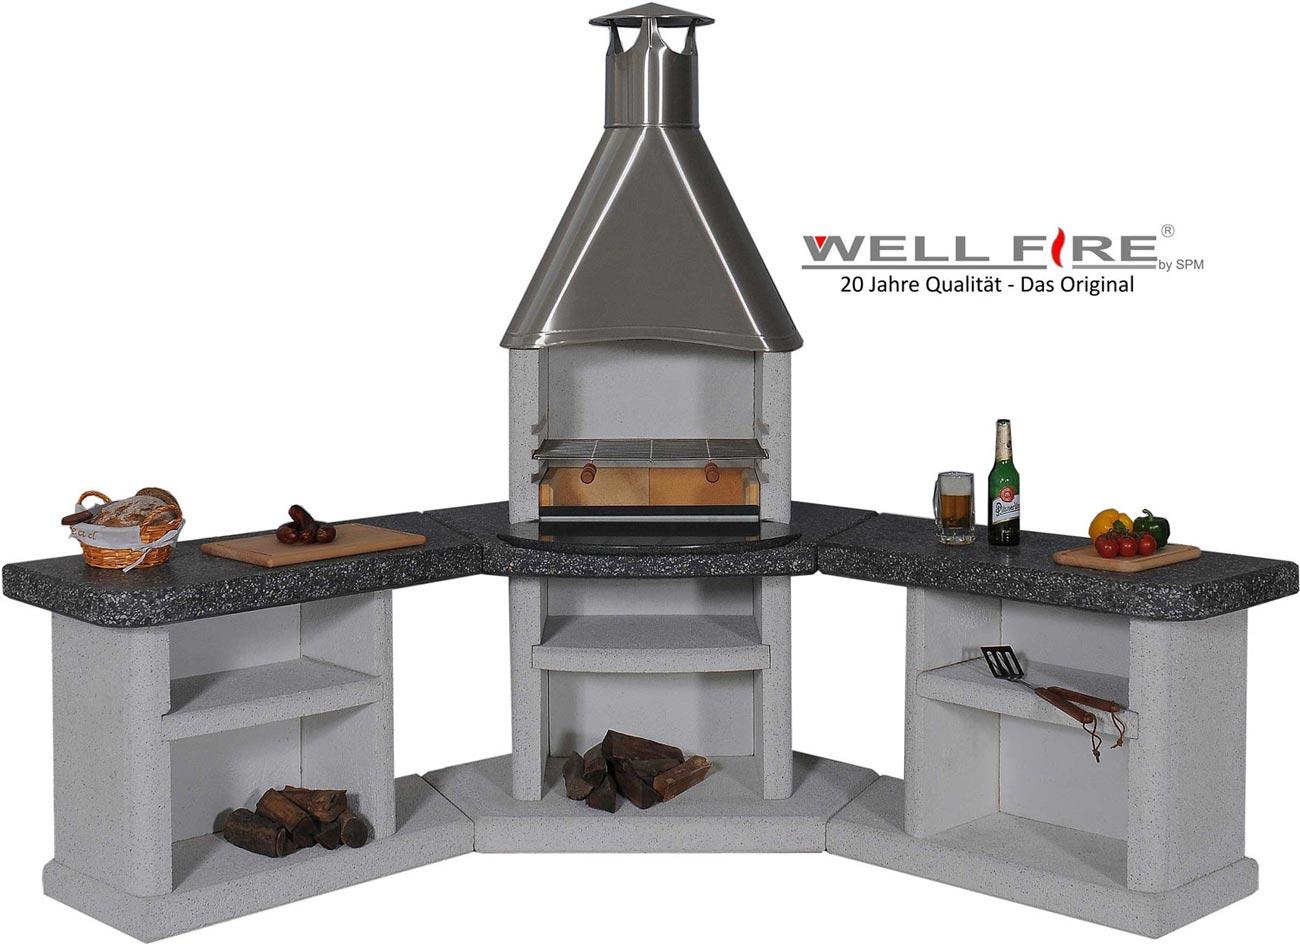 Outdoor Küche Holzkohle : Outdoorküche grillkamin wellfire ardea kaufen cafiro